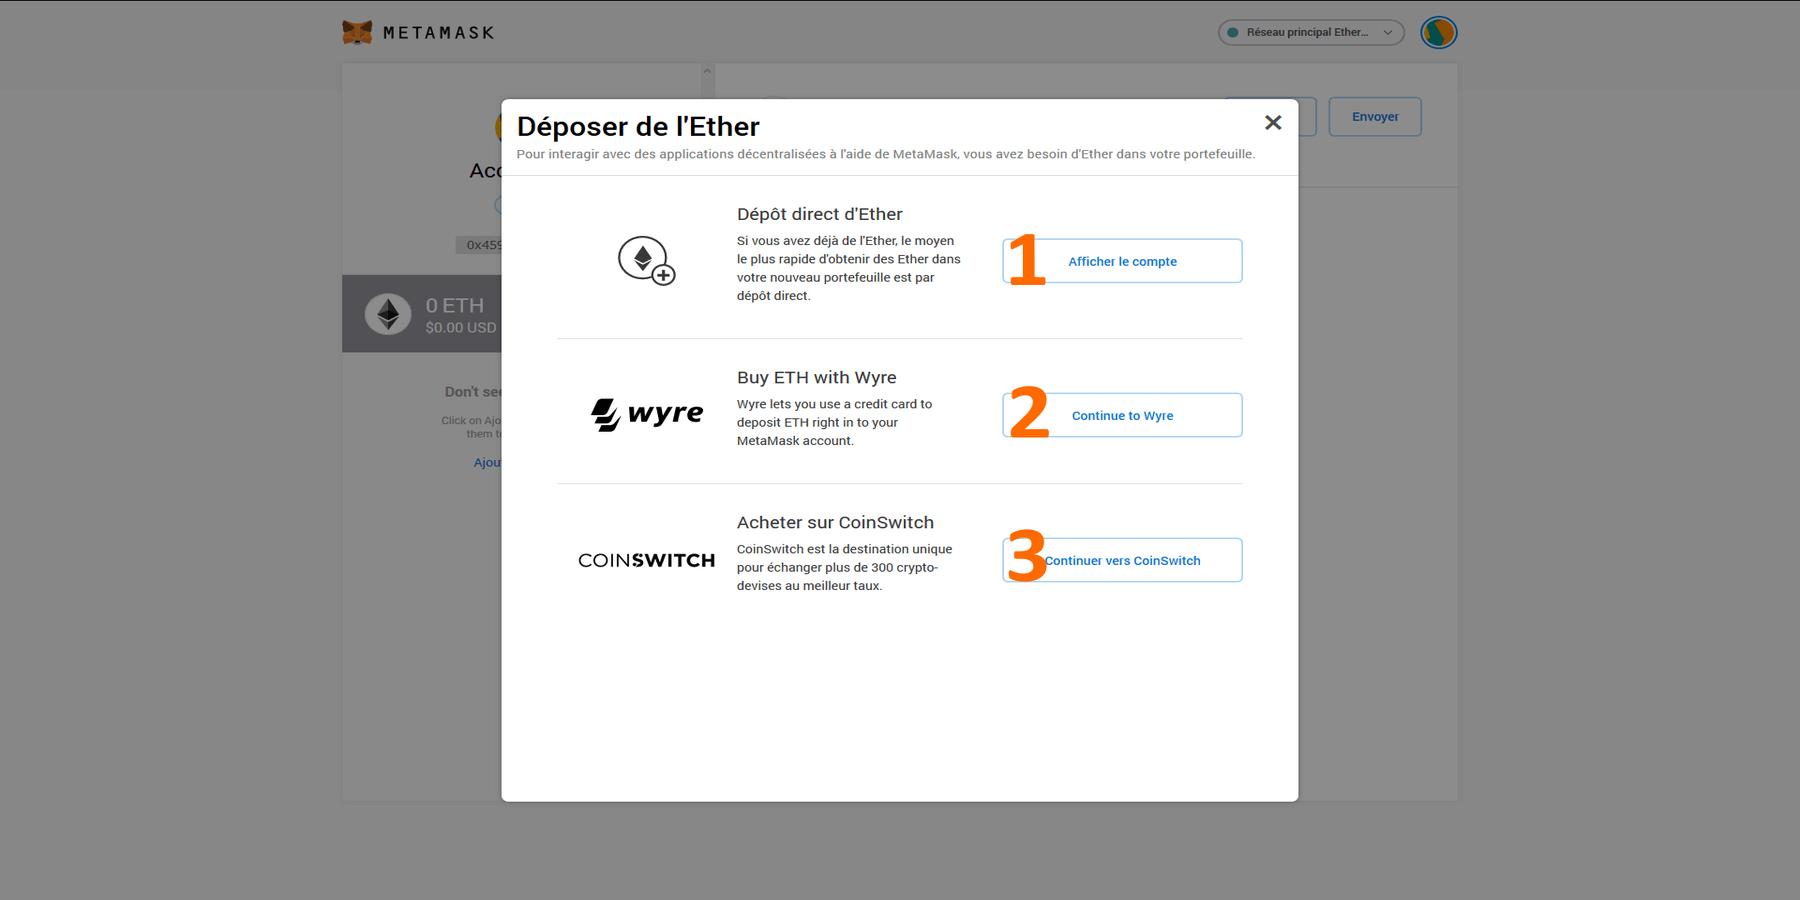 Déposer des Ethereums avec MetaMask